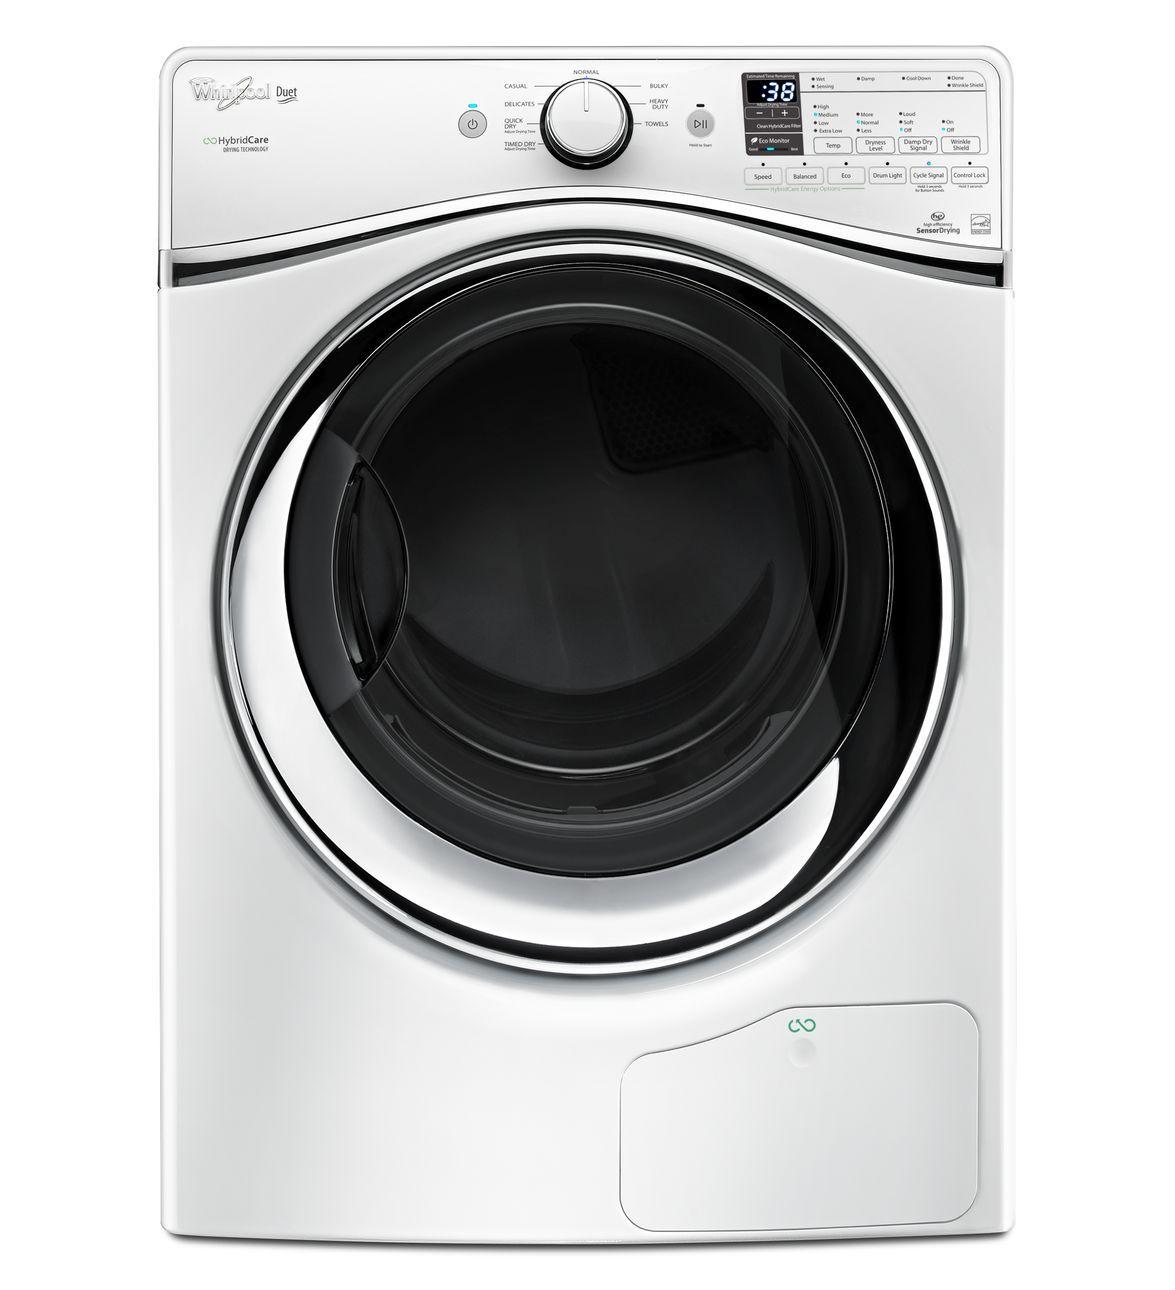 whirl-heat-pump-dryer